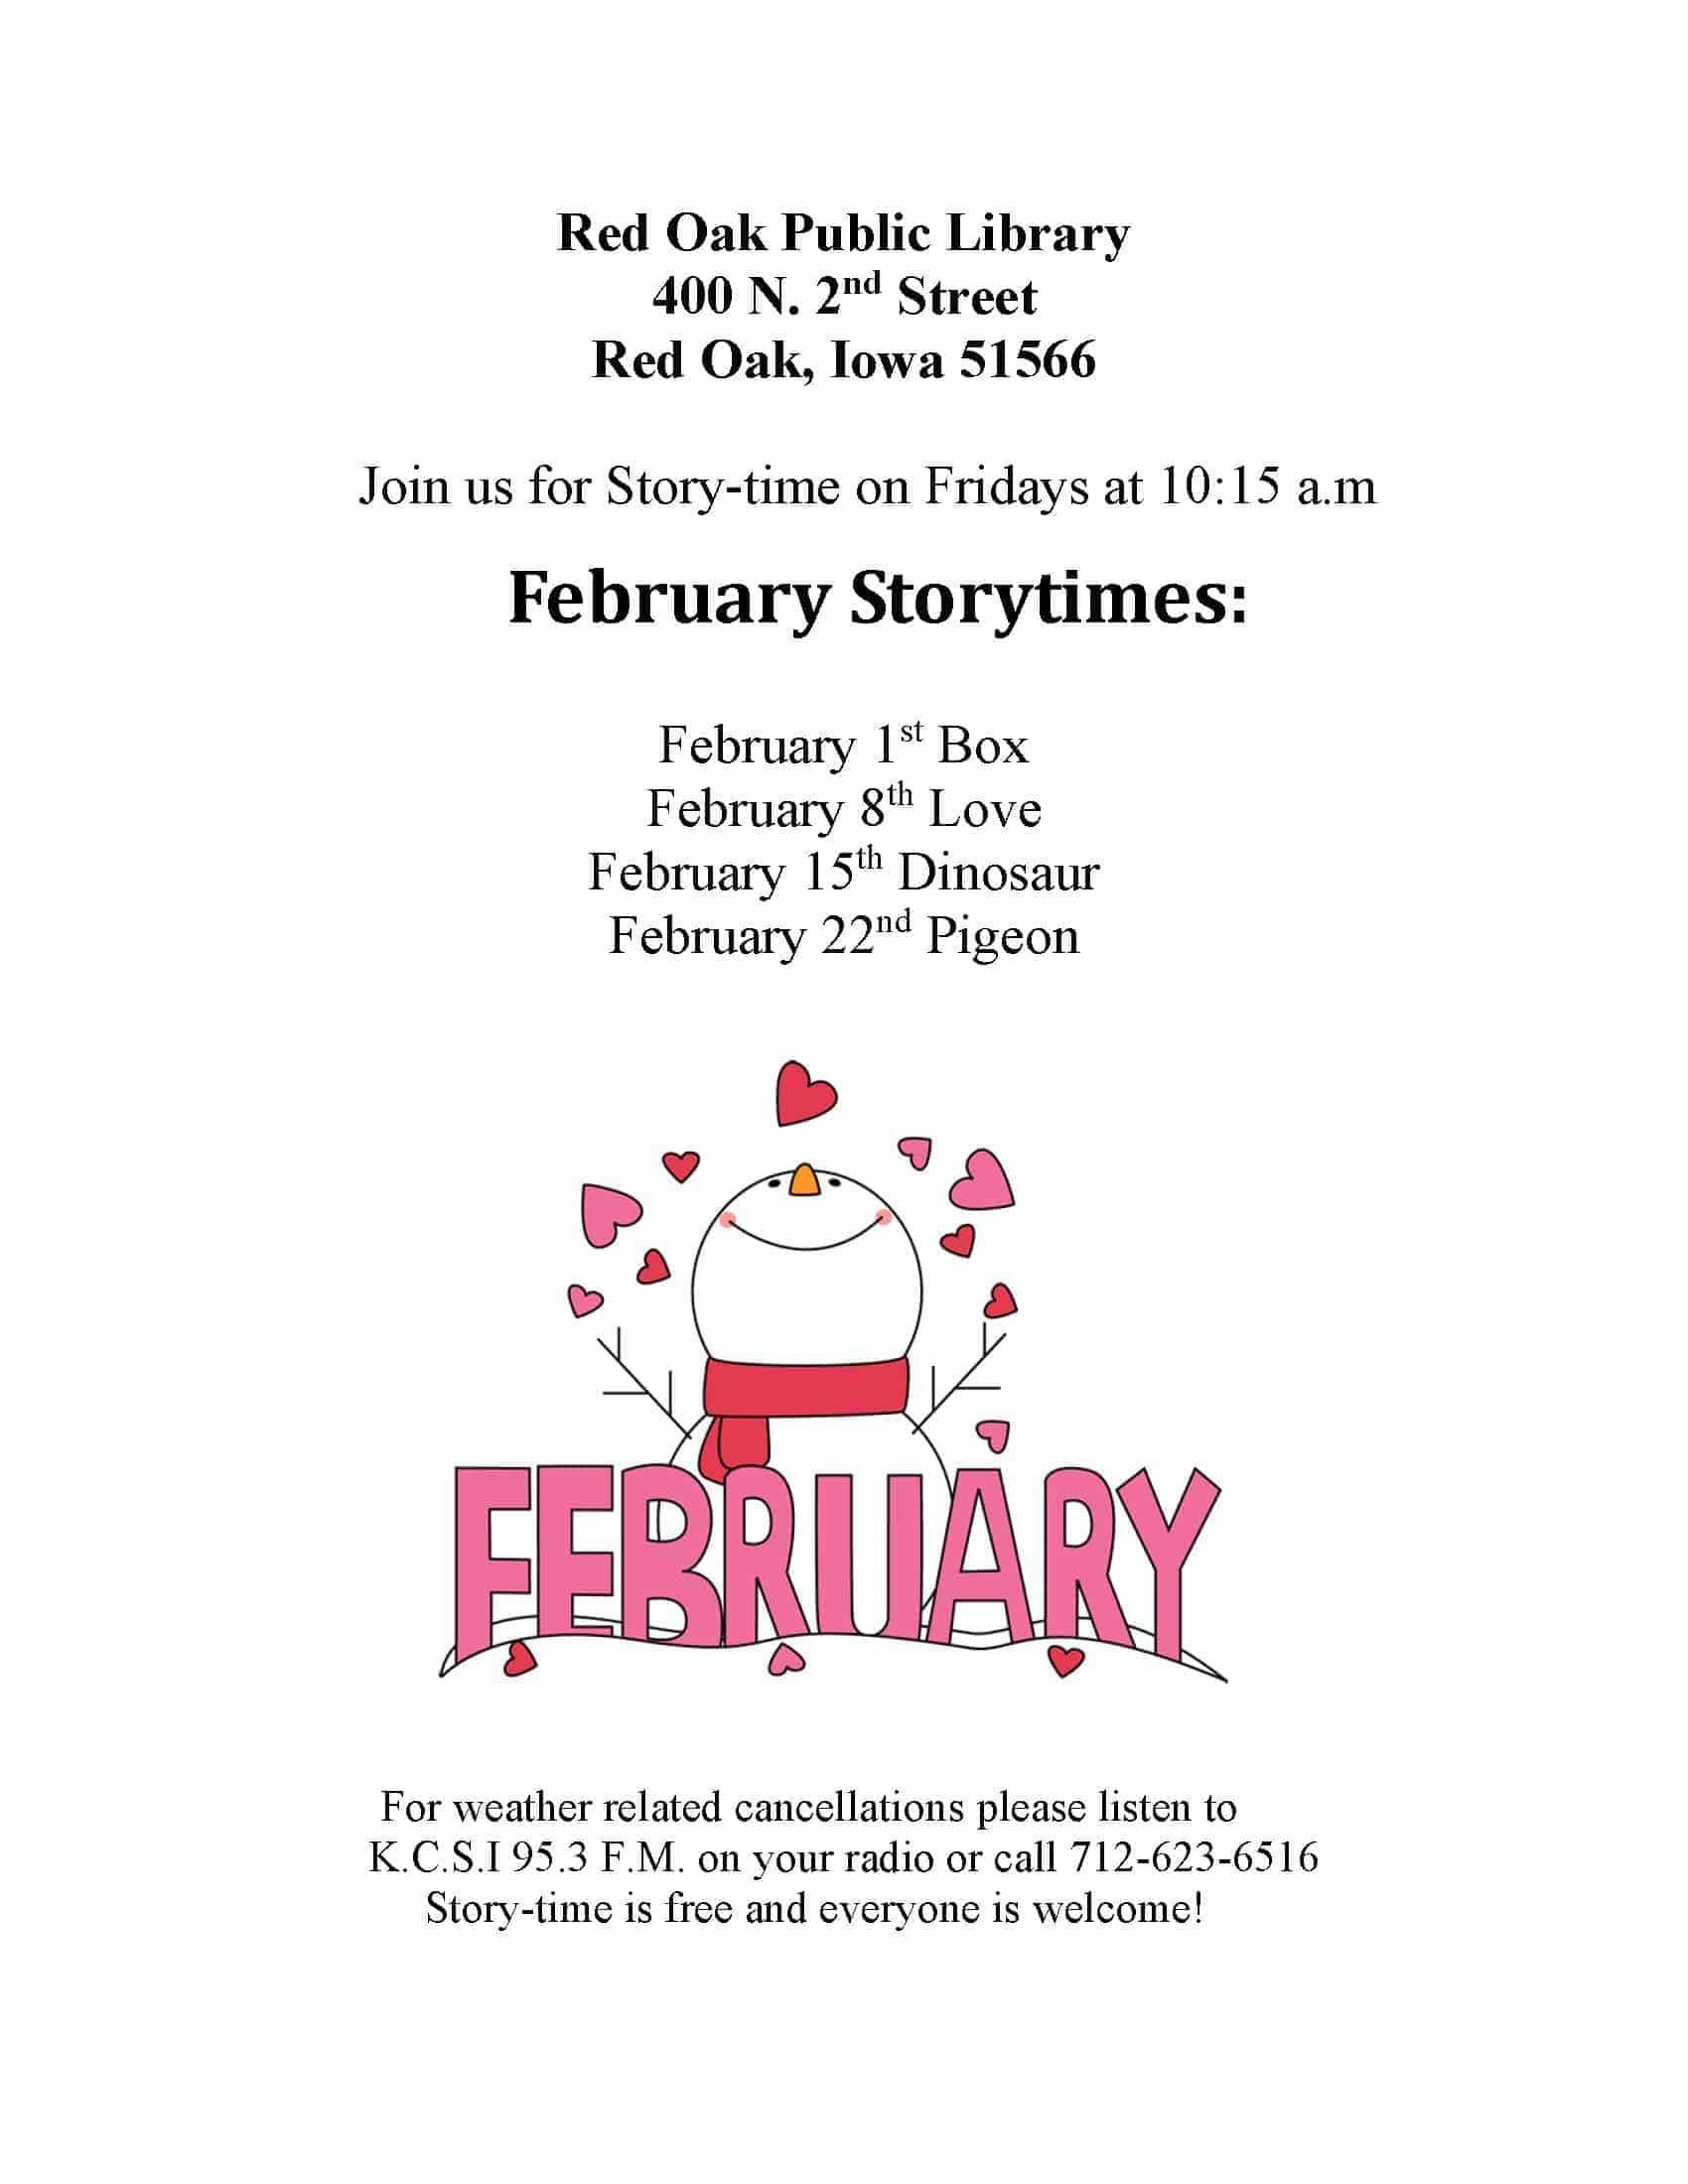 Red Oak Public Lib storytime Feb. 2019